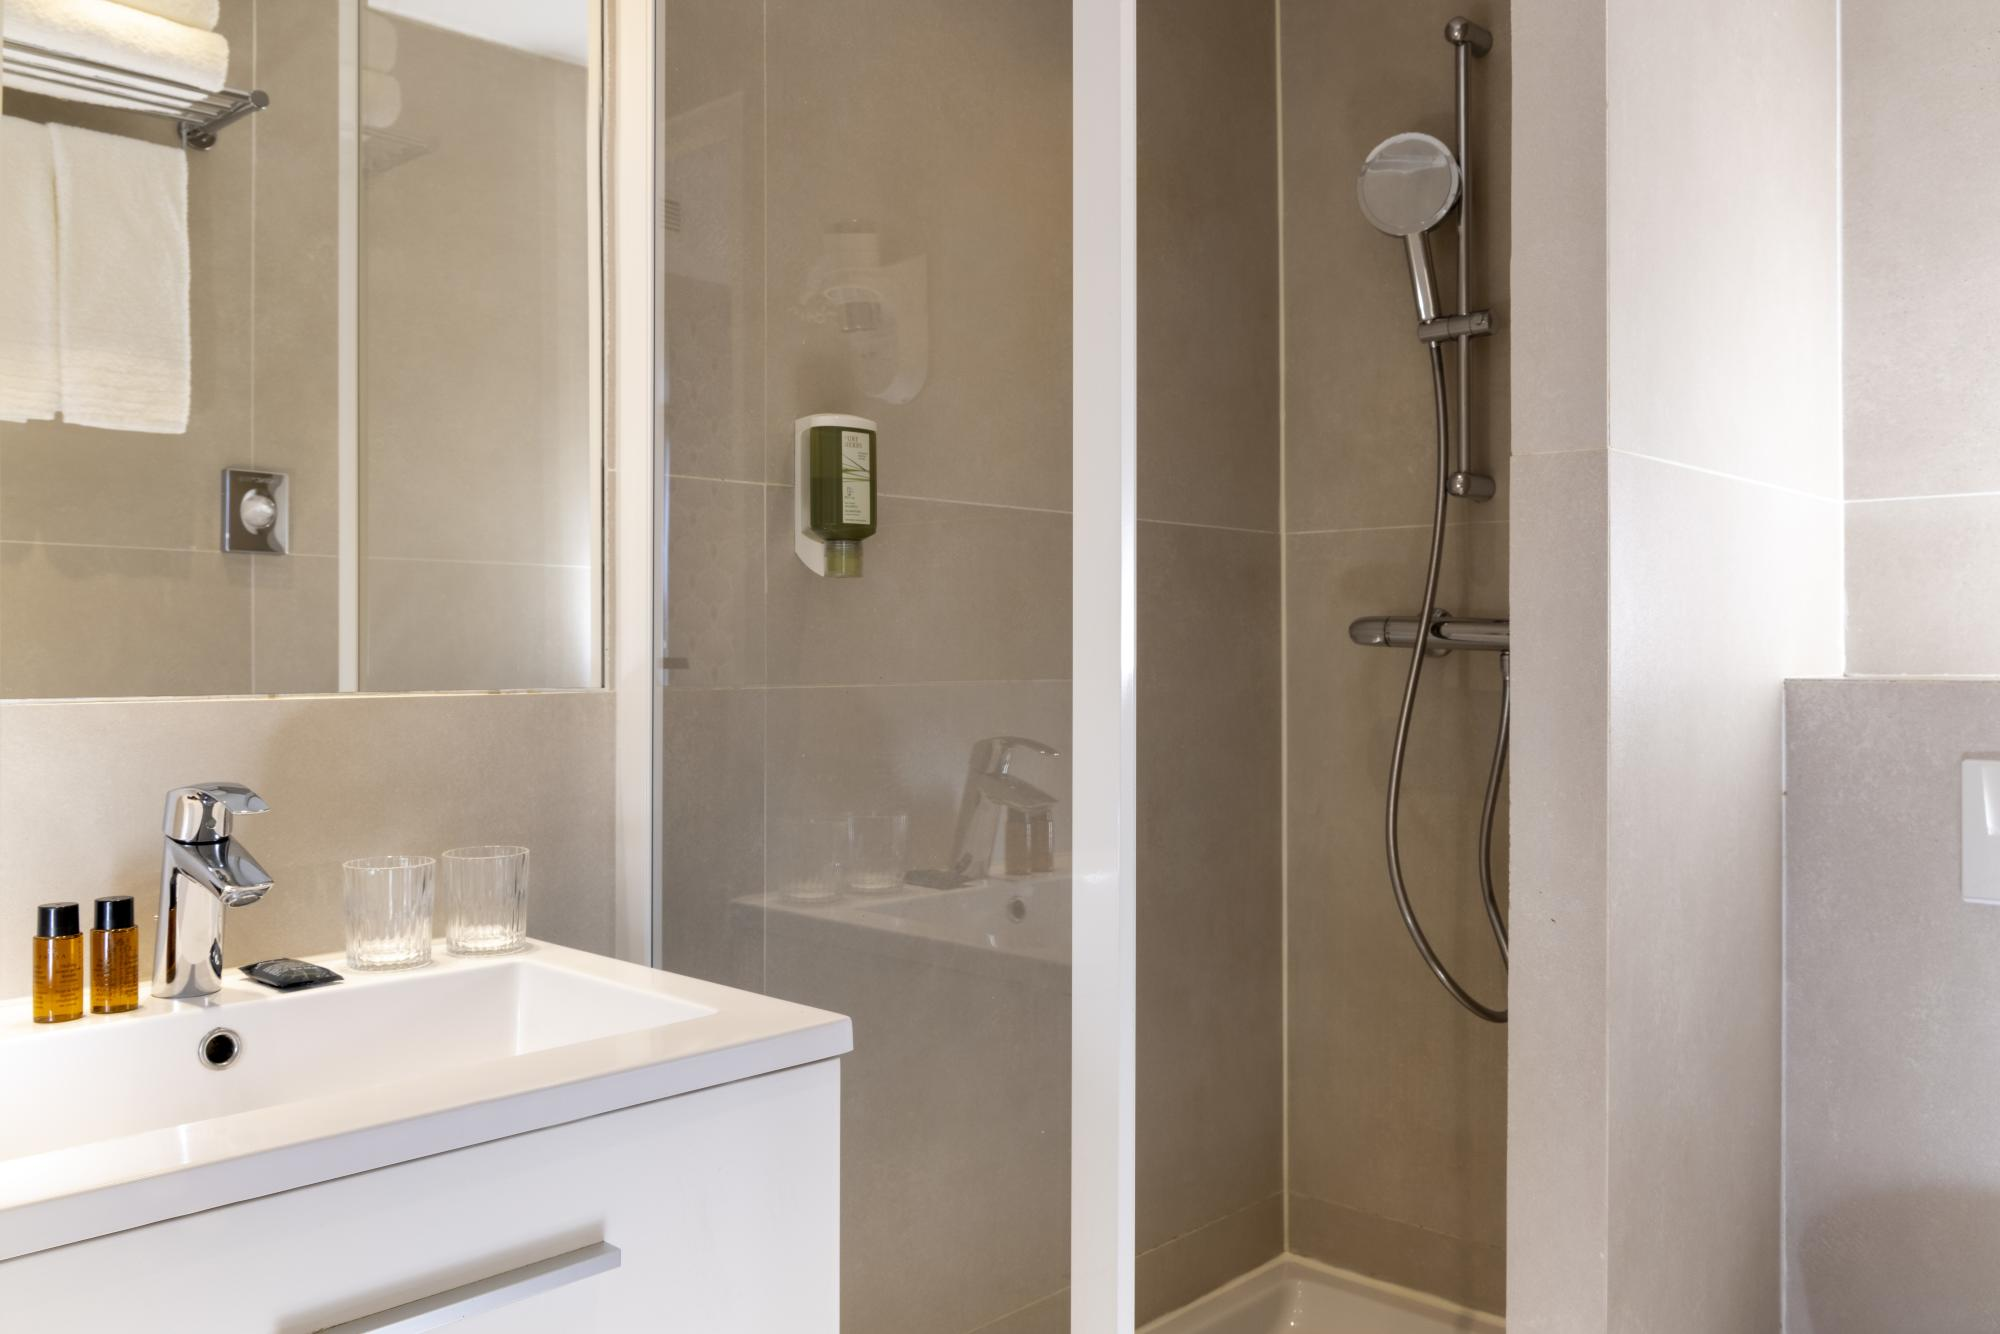 Hotel Brady Superior Room bathroom